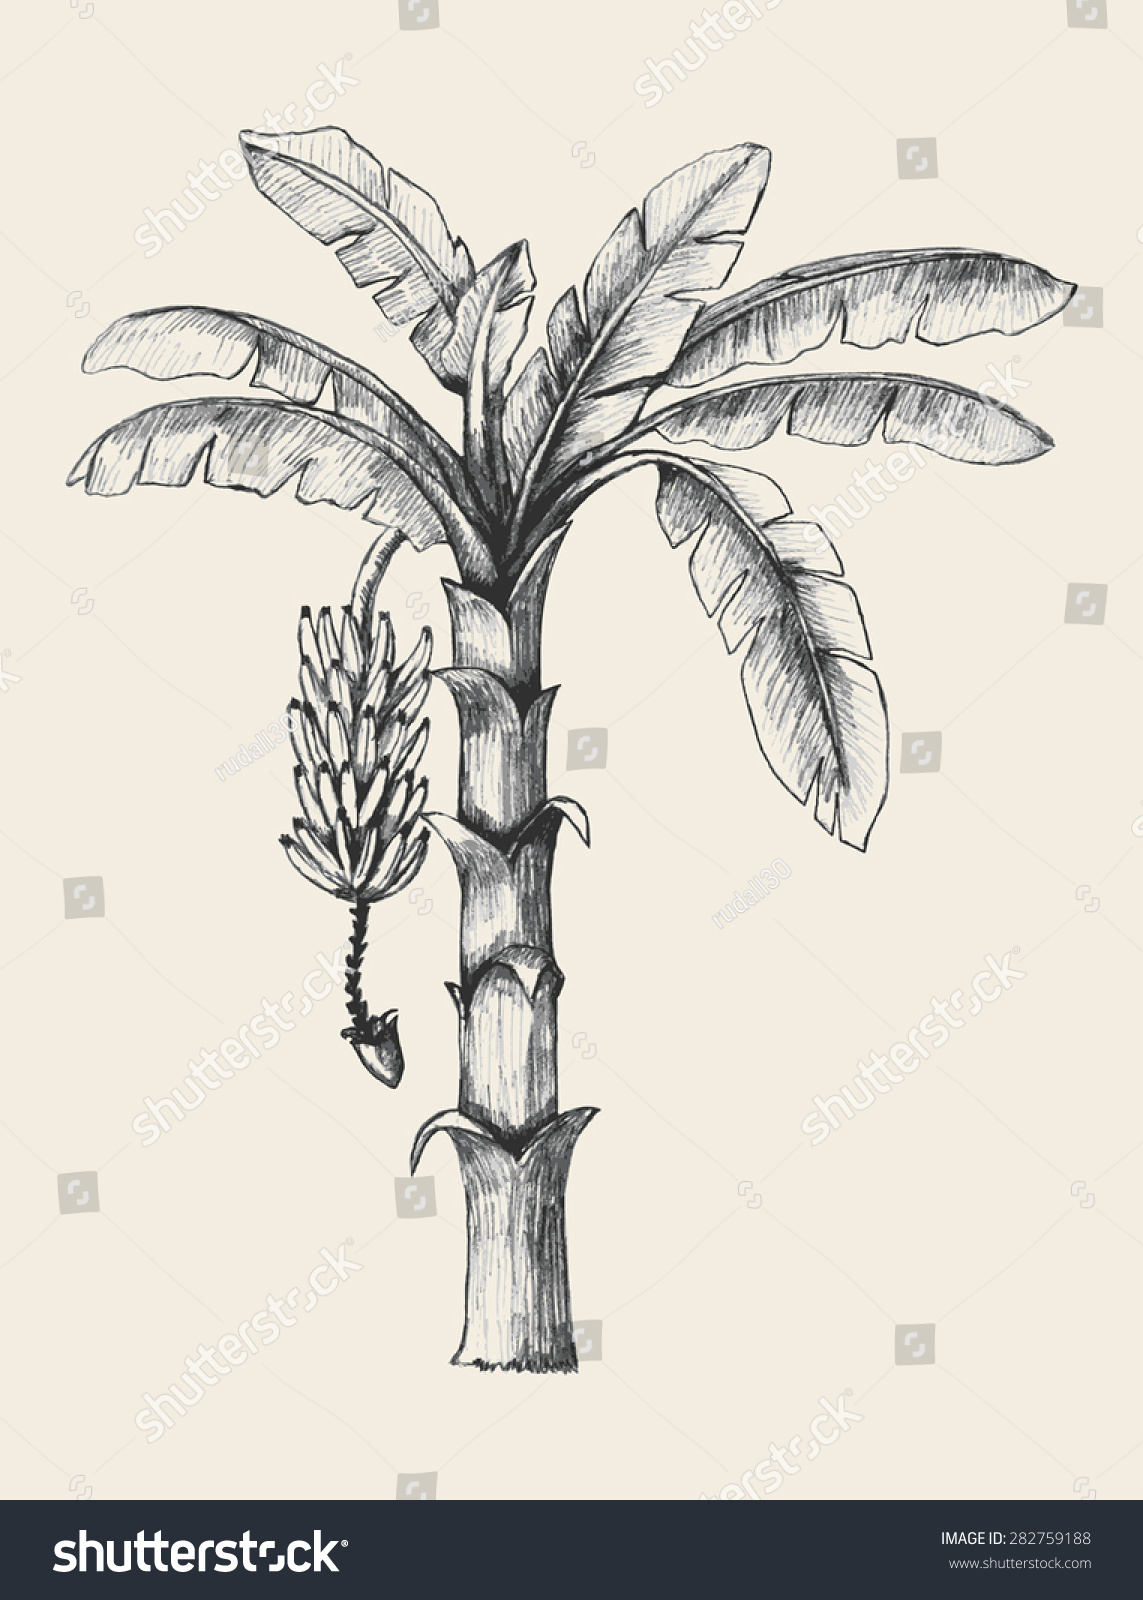 Sketch illustration banana tree stock vector royalty free 282759188